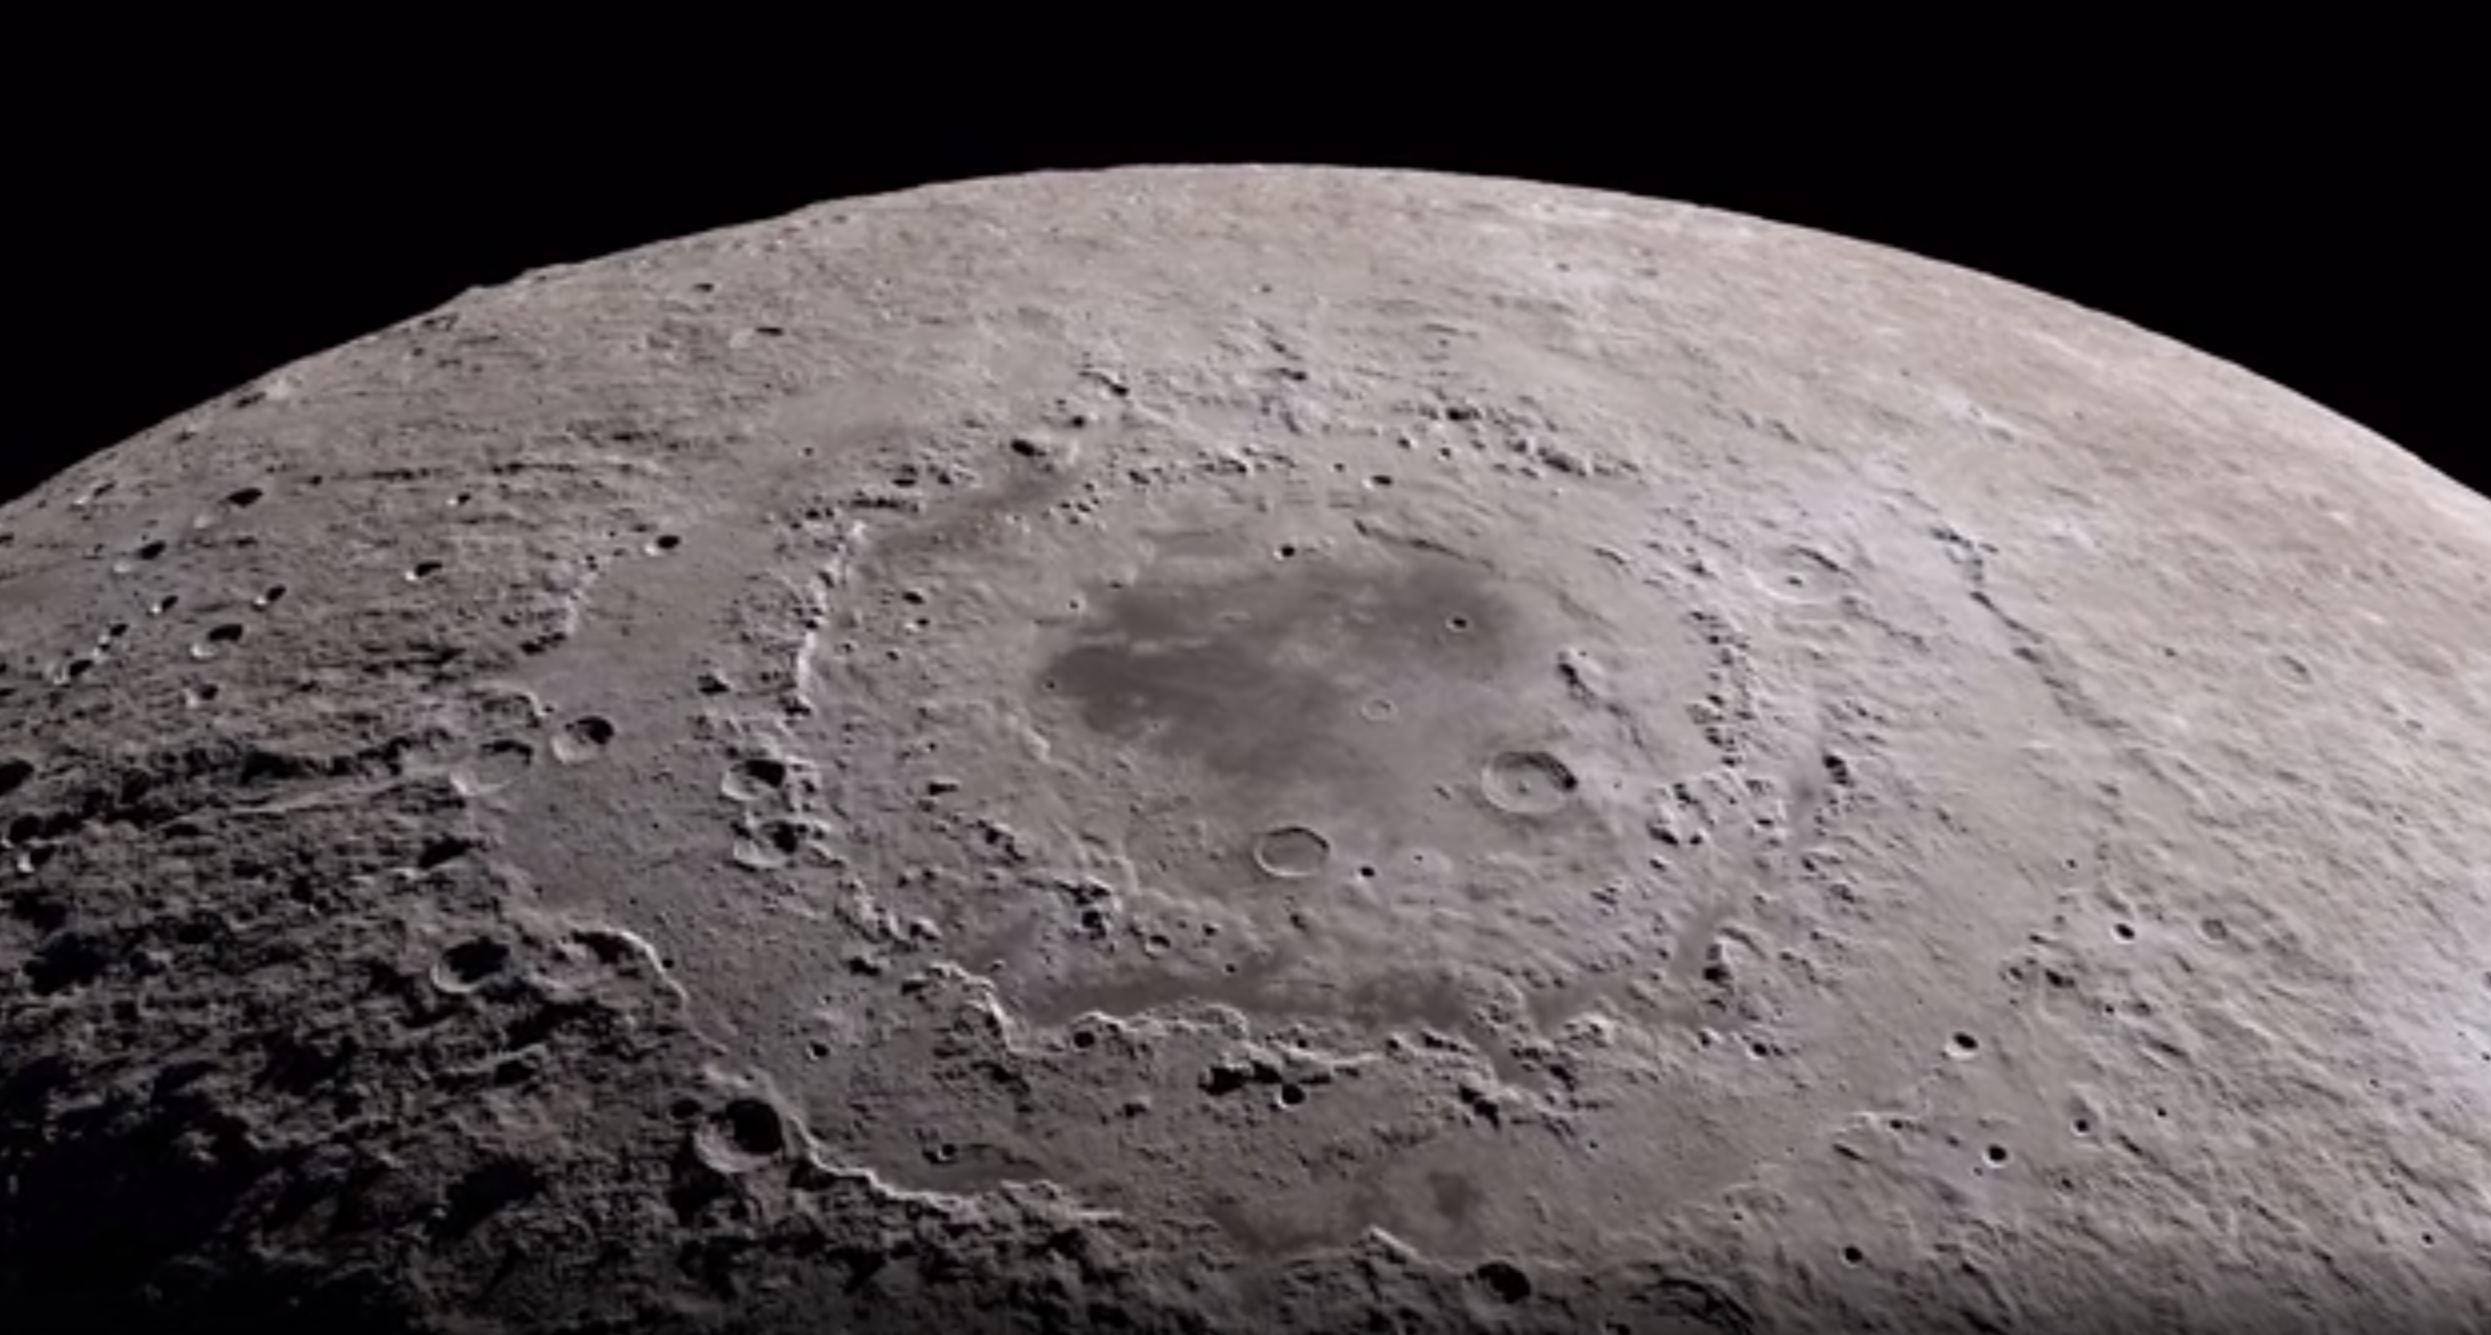 The south pole of the moon - Image Credit  NASA via Scientific Visualization Studio